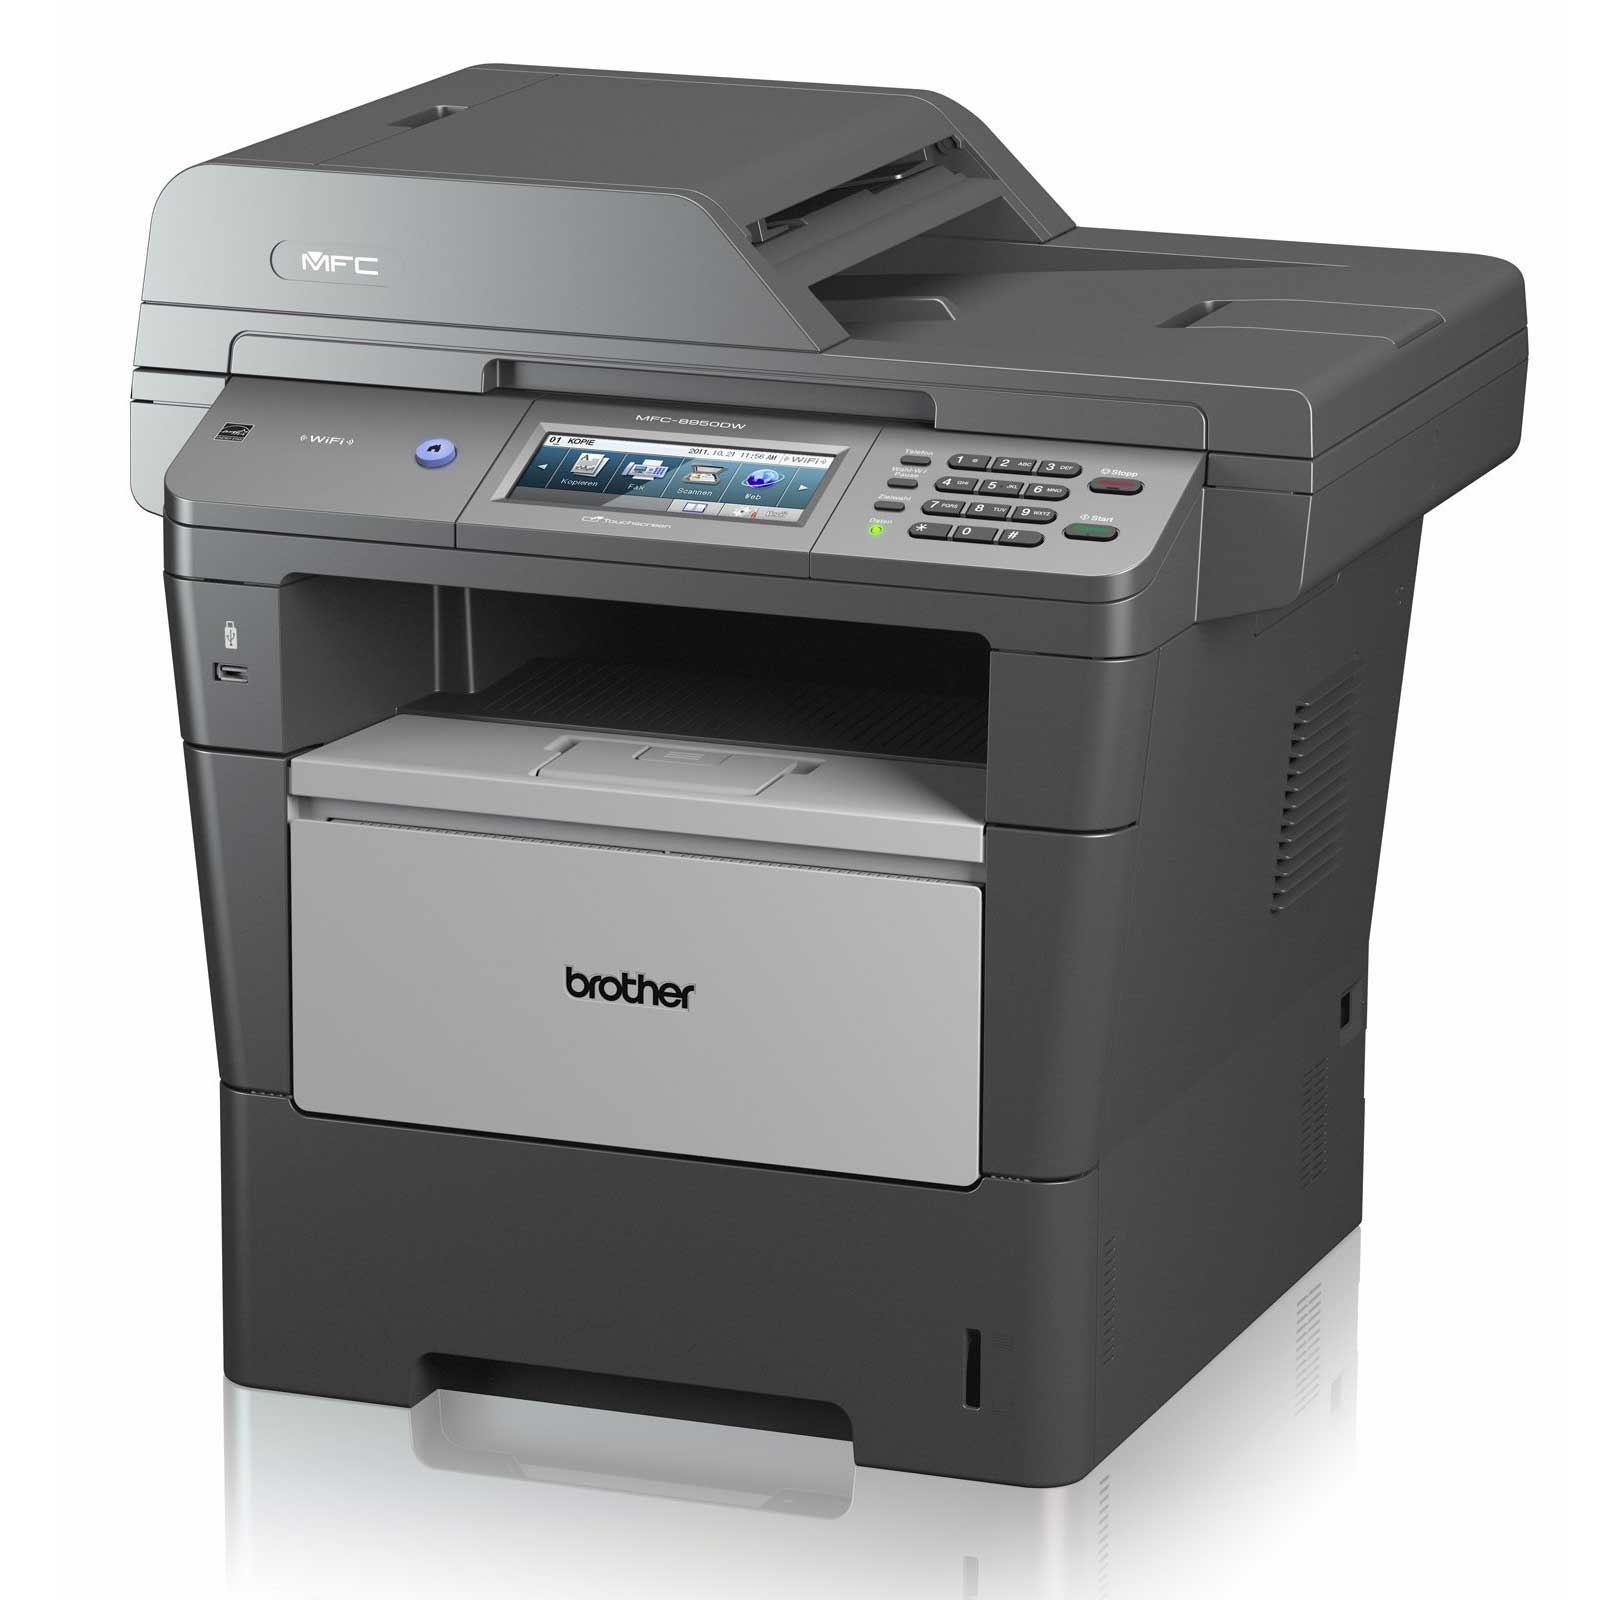 Принтер Brother MFC-8950DW